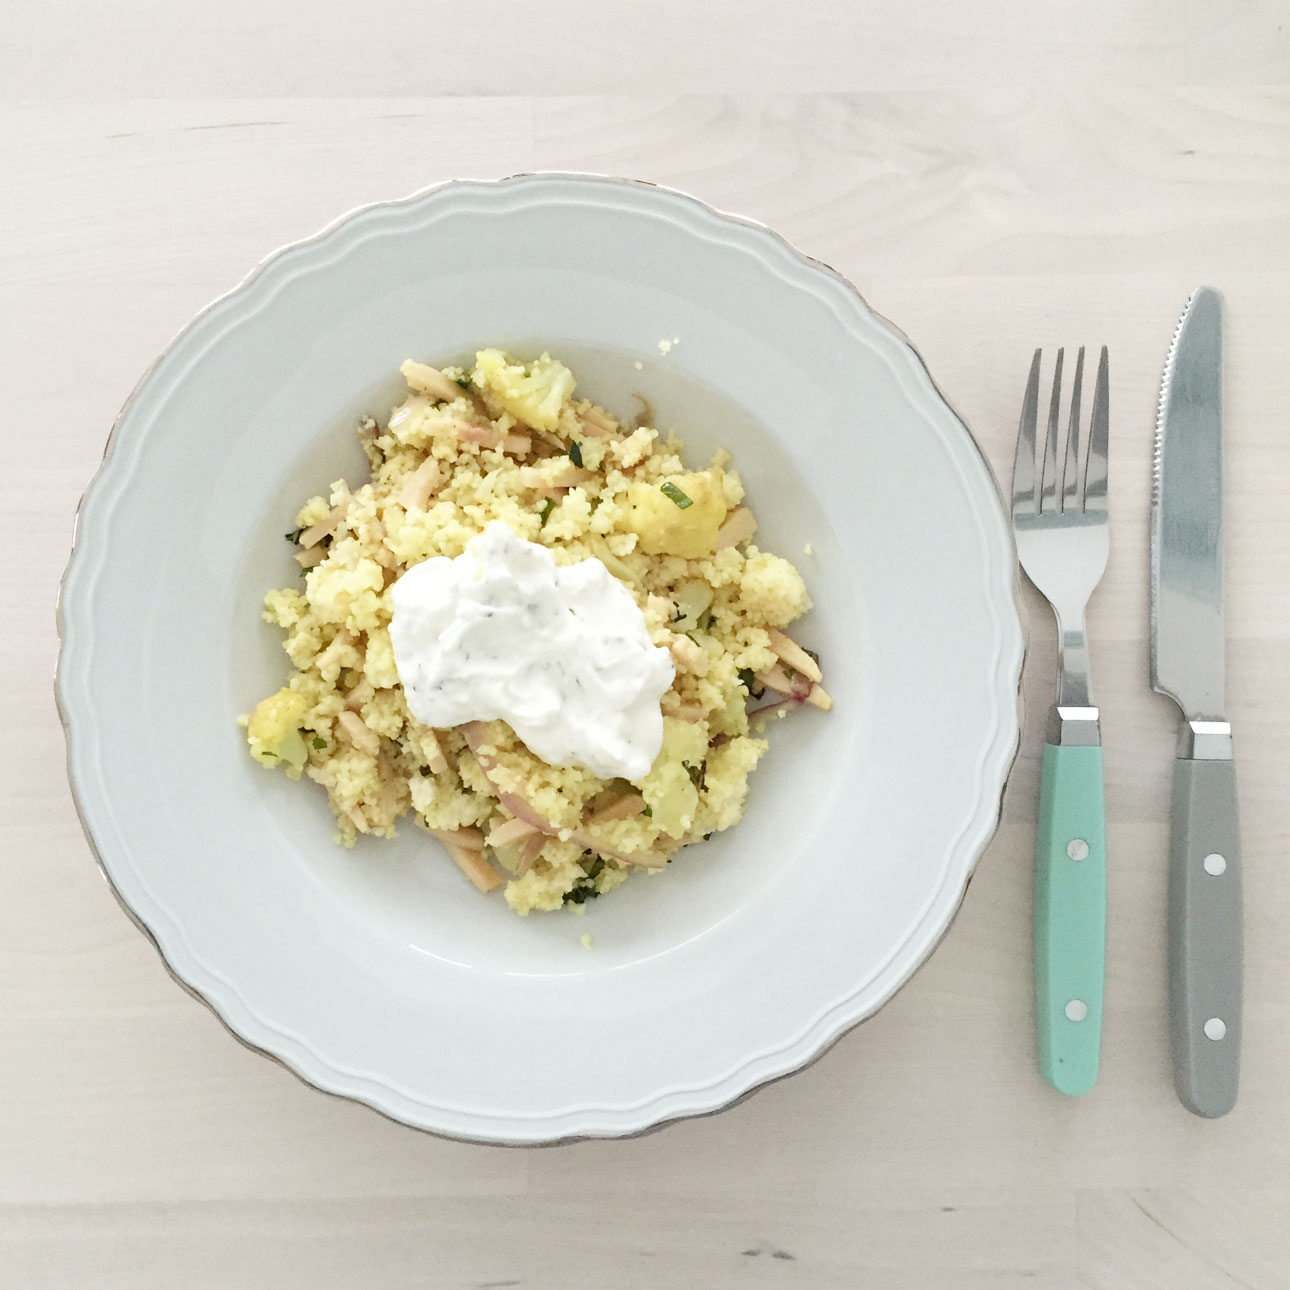 Recept couscous bloemkool kip yoghurt